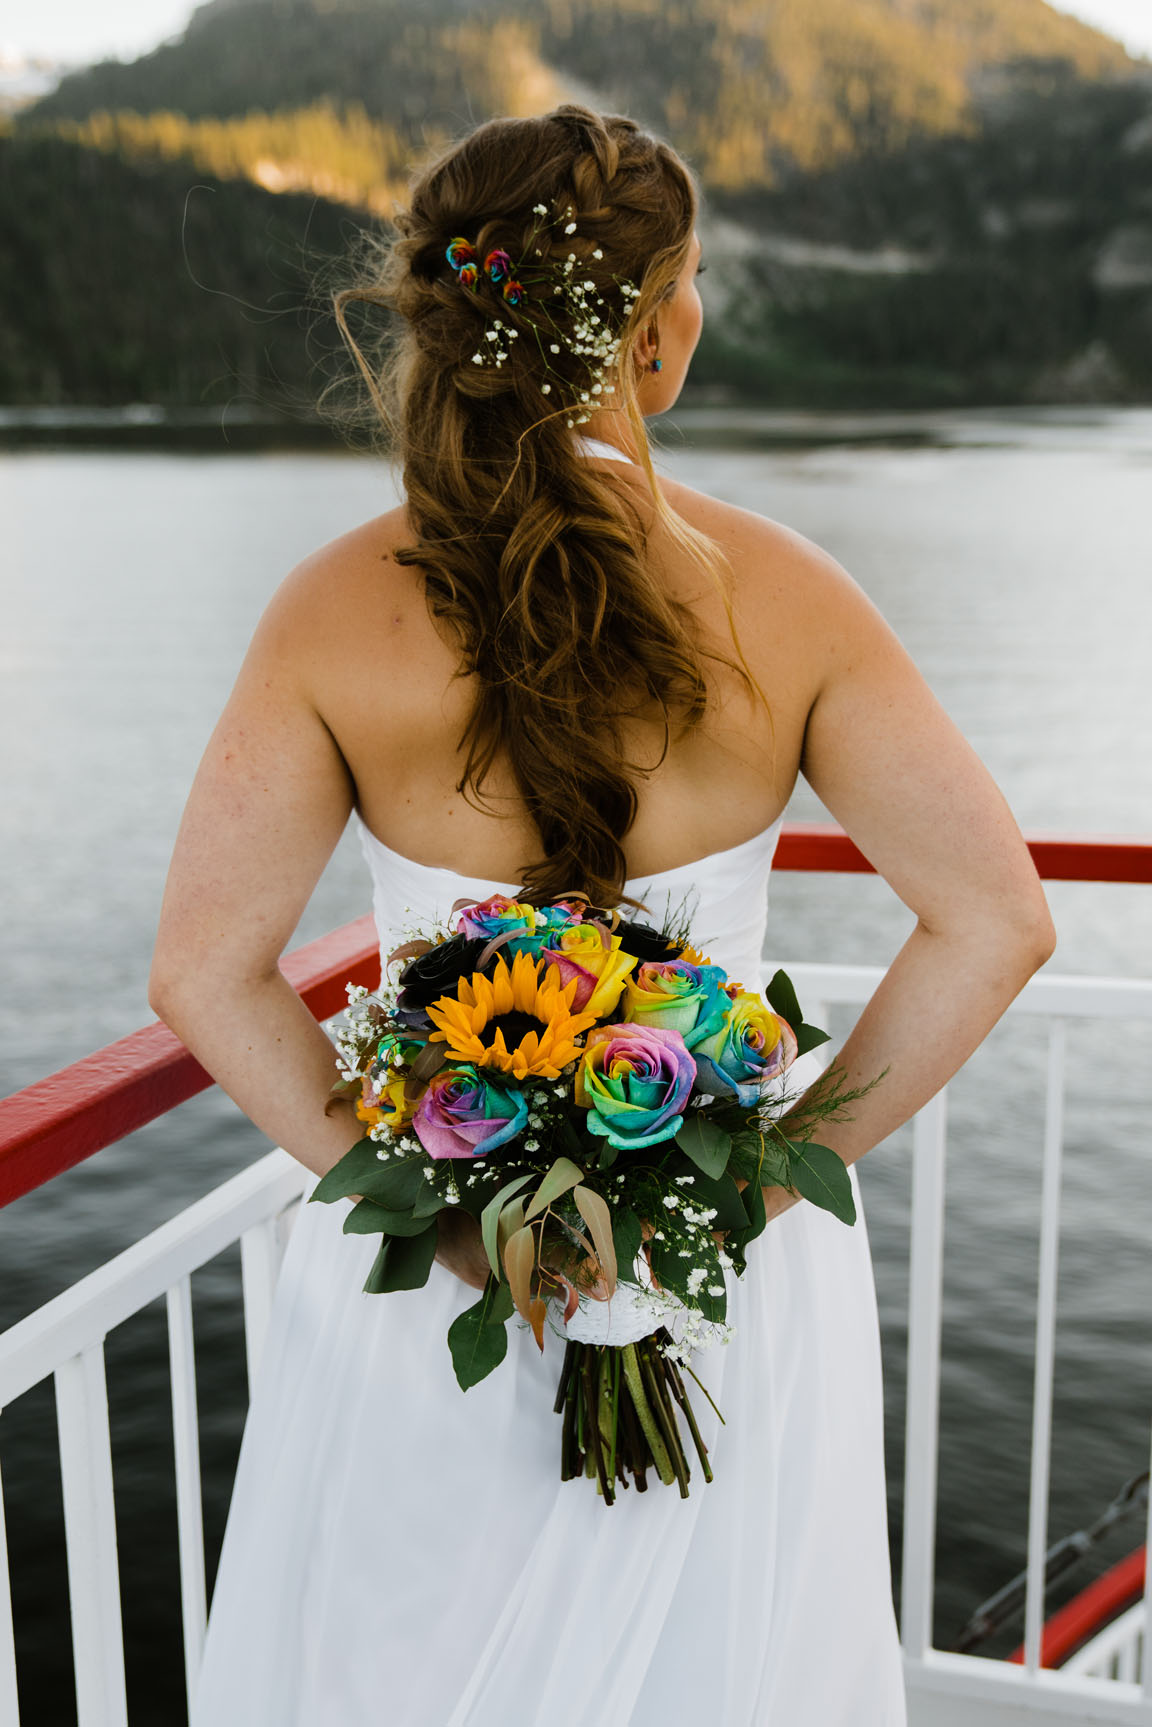 Tie dye wedding bouquet Zephyr Cove Wedding | South Lake Tahoe Wedding | Sonora Photographer | Yosemite Elopement Photographer Bessie Young